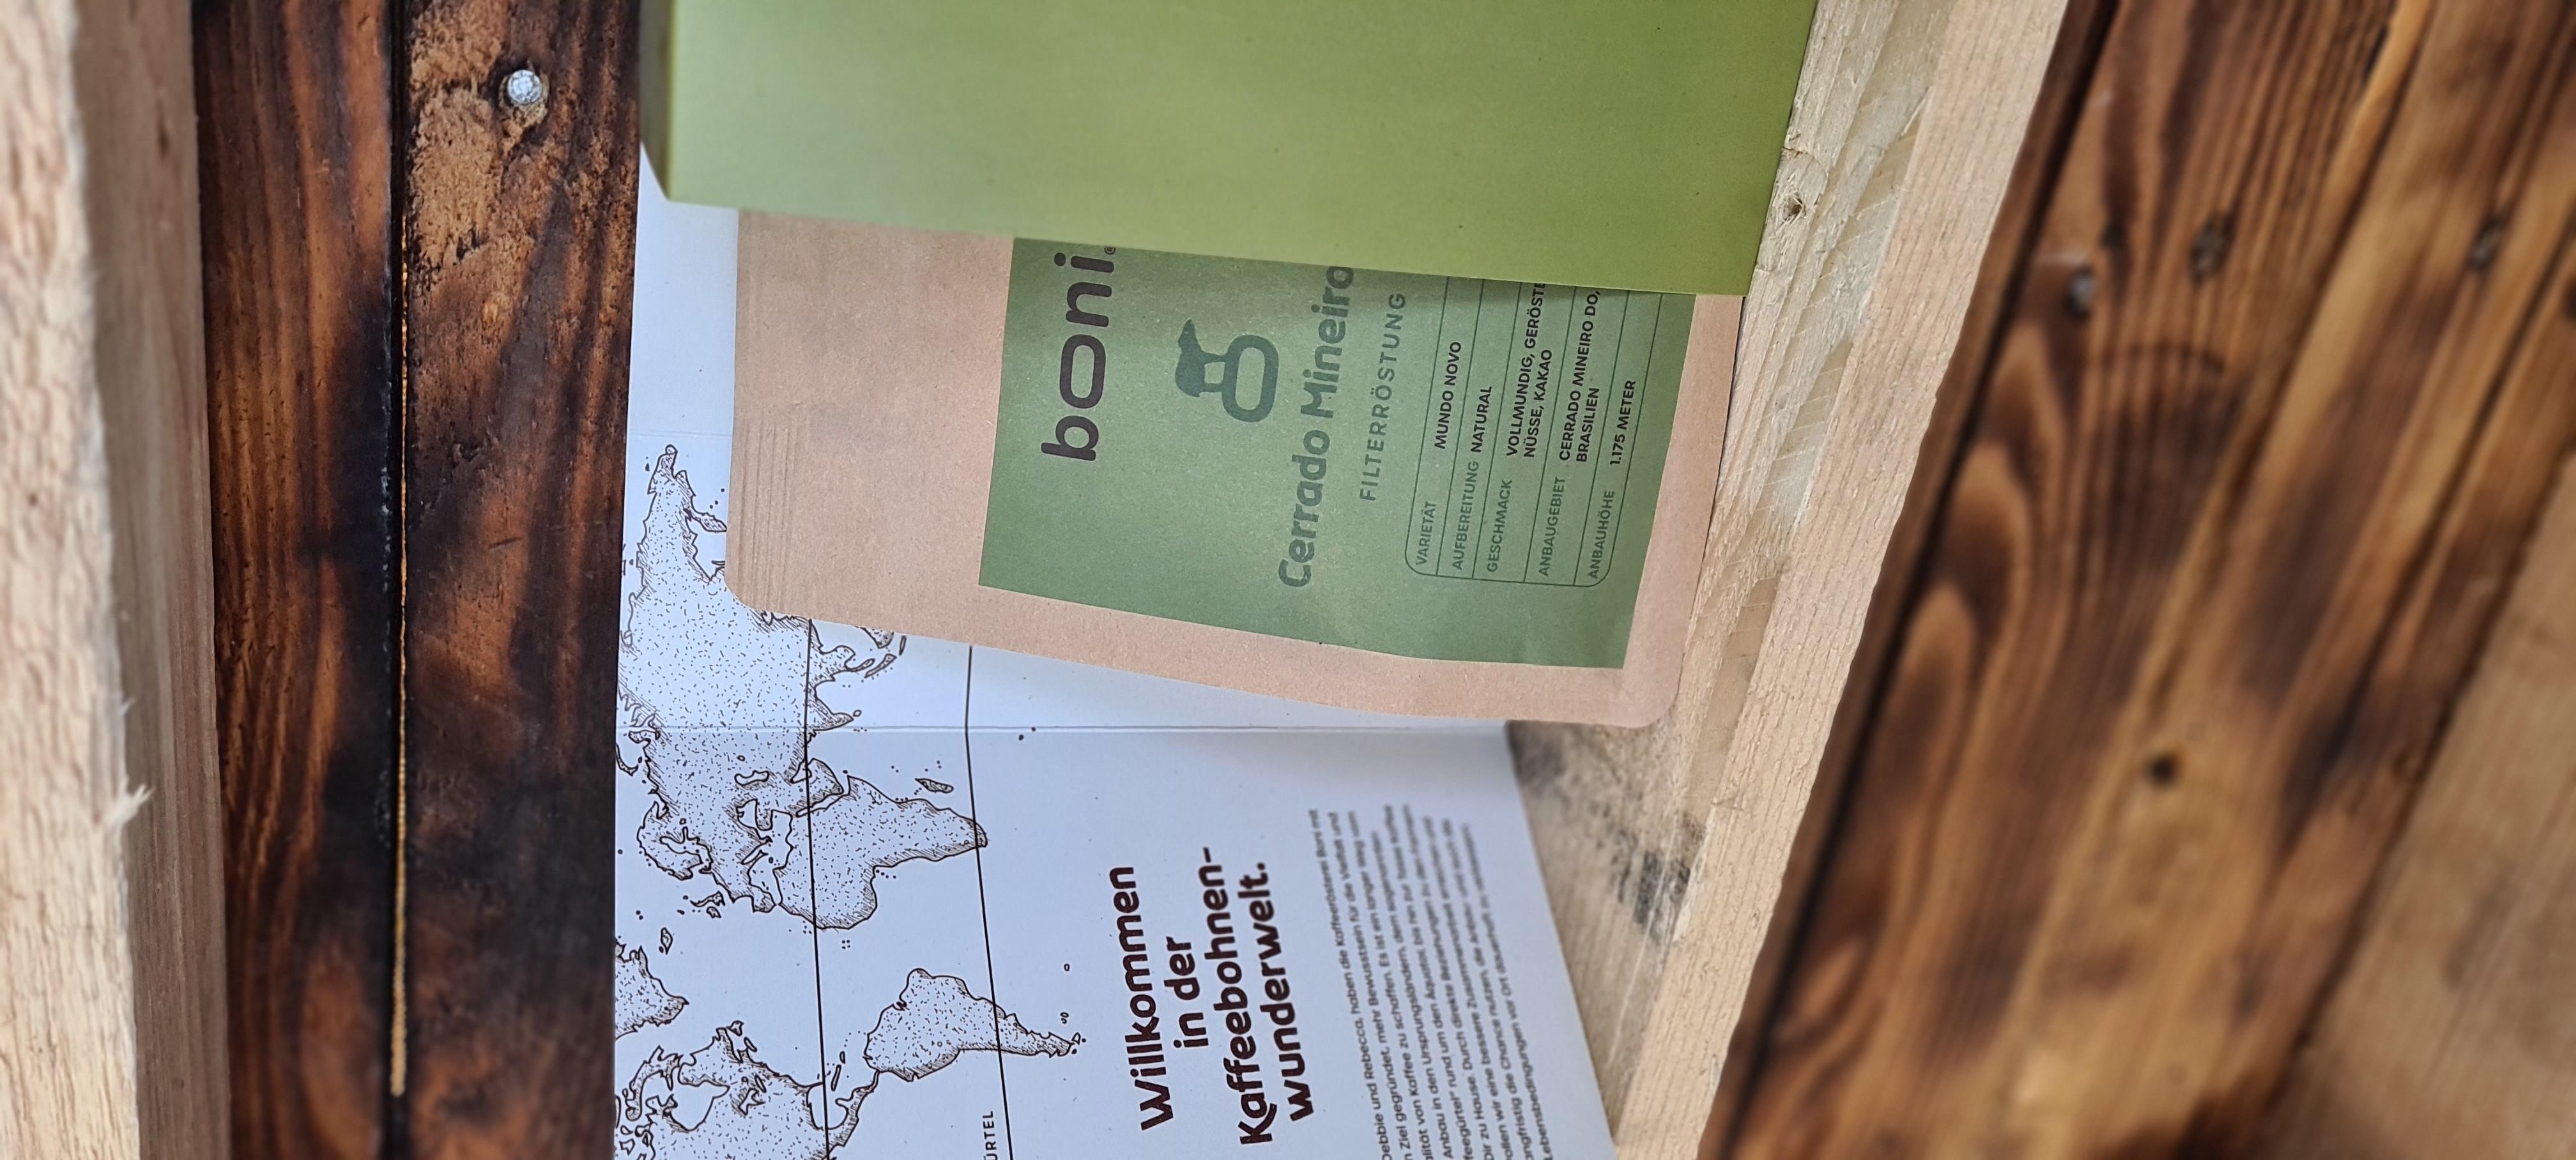 Kaffee-Buch Cerrado Mineiro Filterröstung